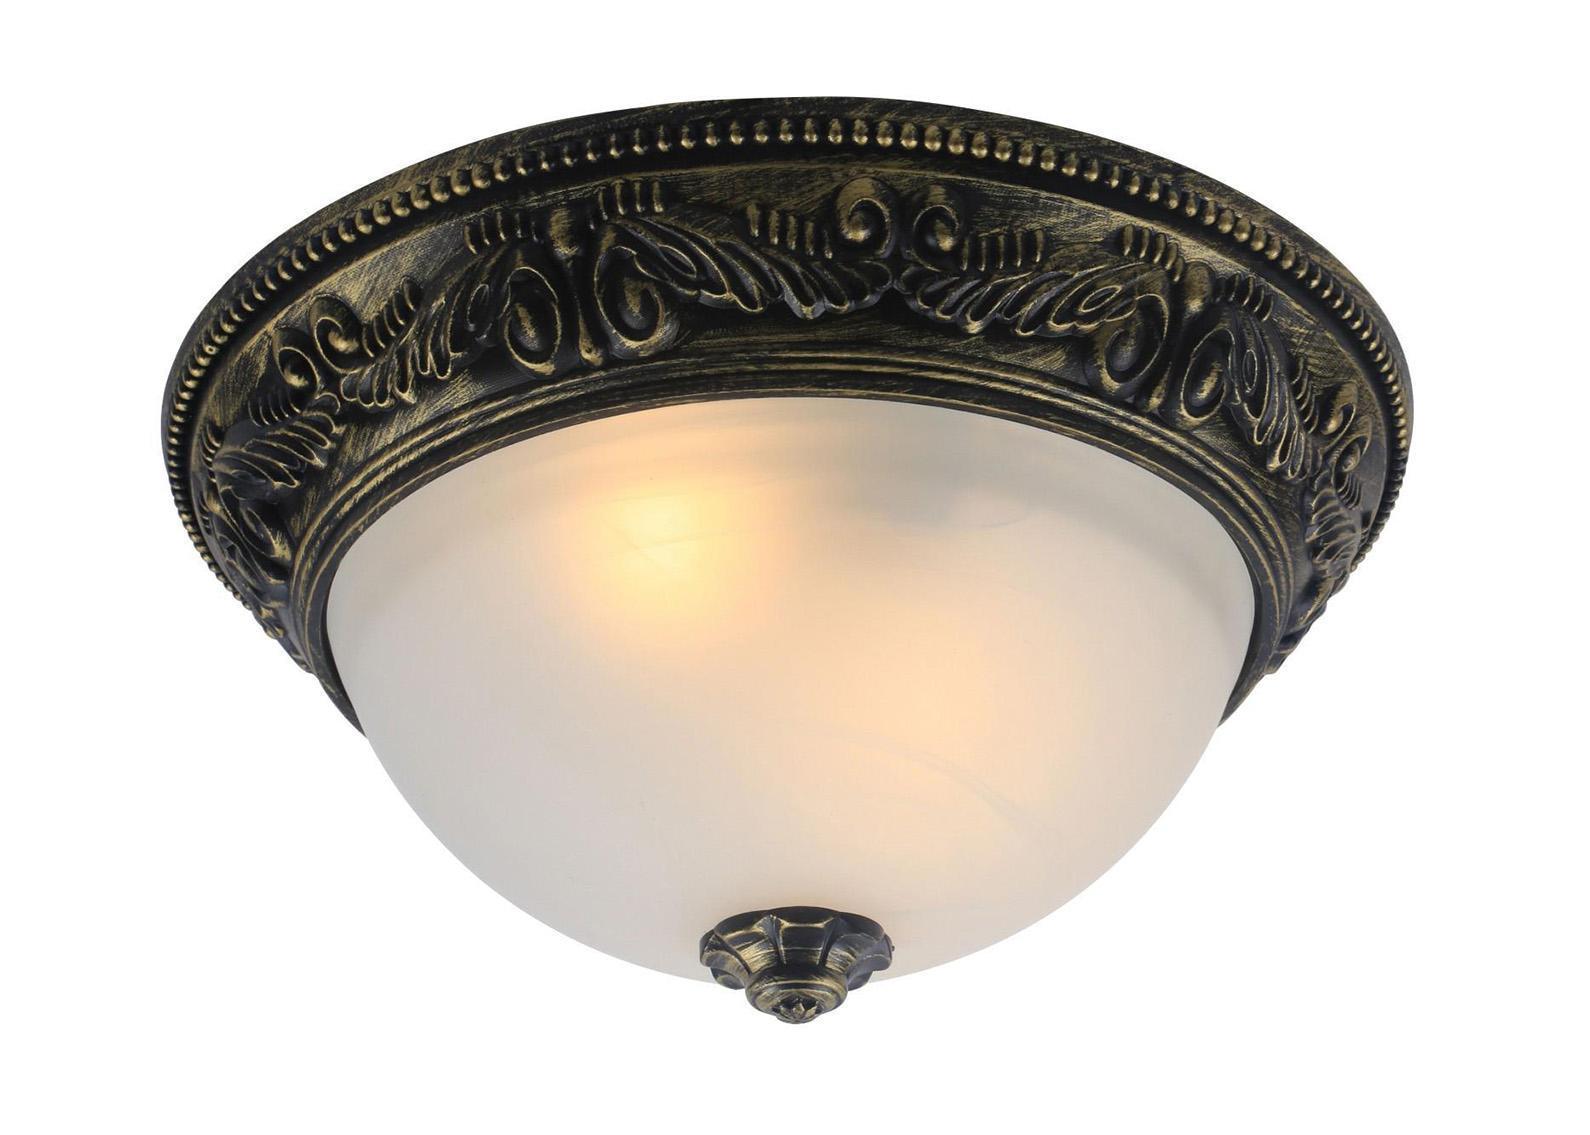 A8010PL-2AB PIATTI Потолочный светильник arte lamp piatti a8003pl 2ab